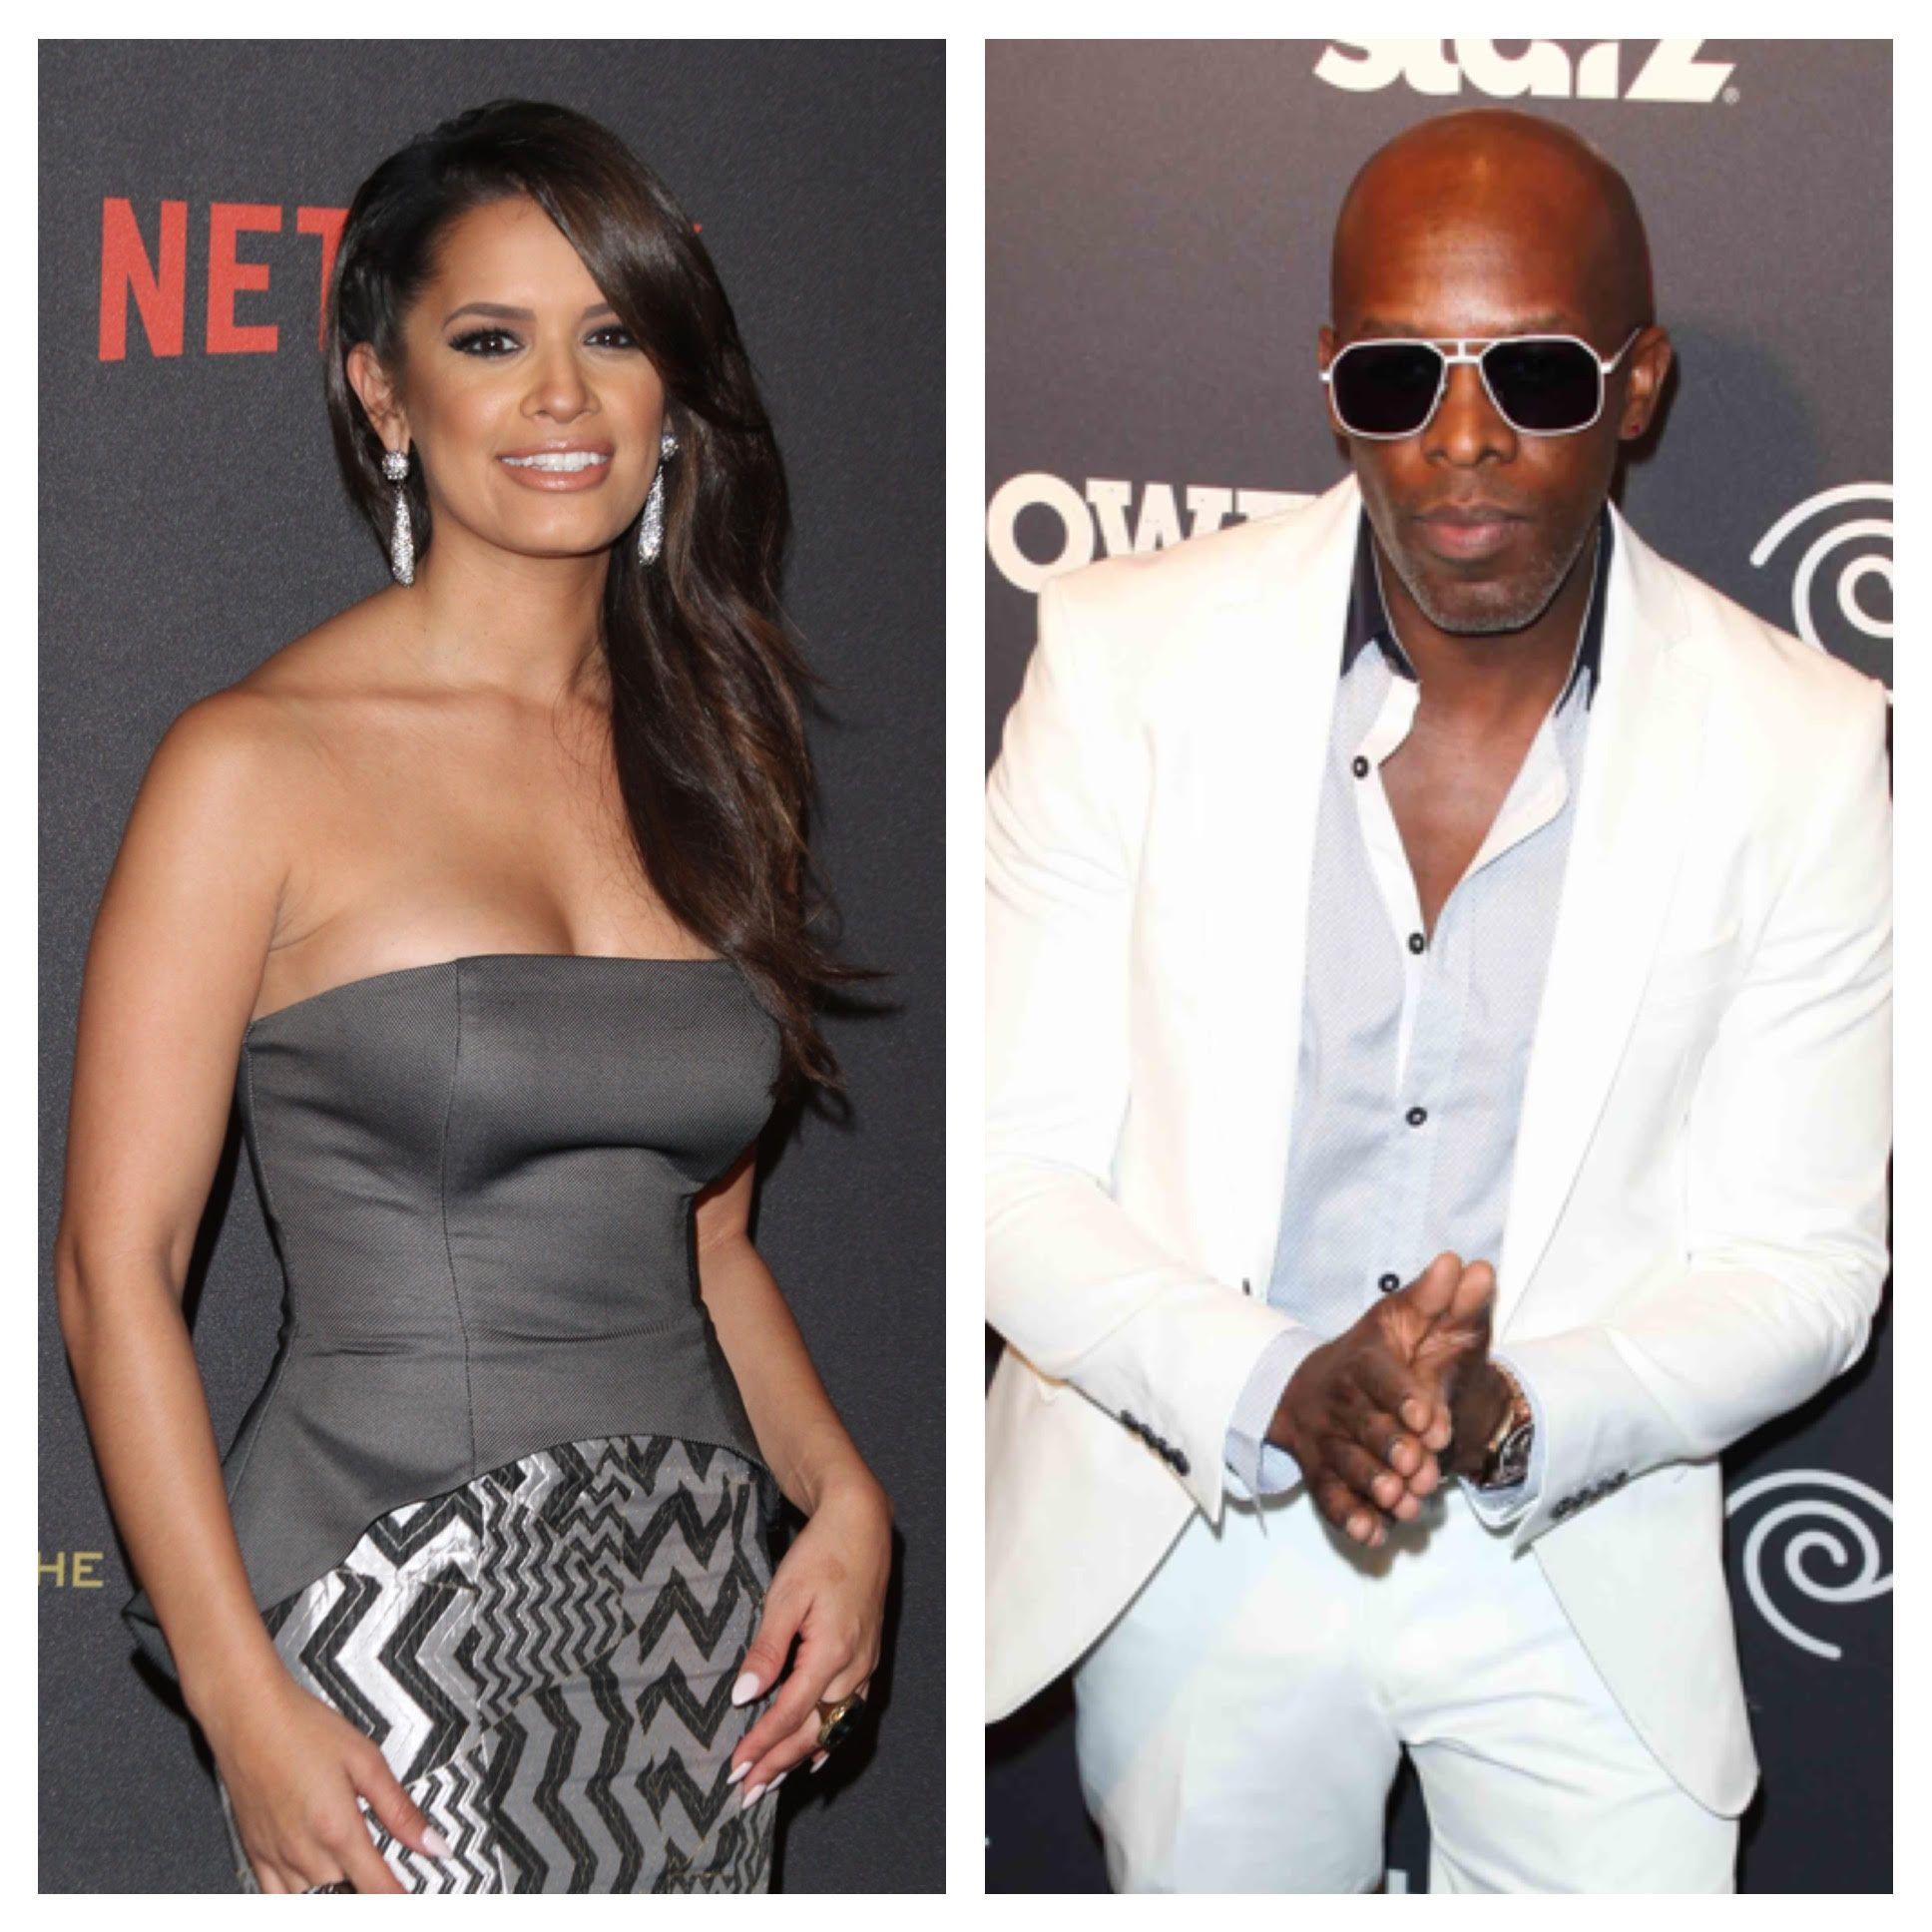 New Couple Alert: TV Host Rocsi Diaz and Singer Joe Out